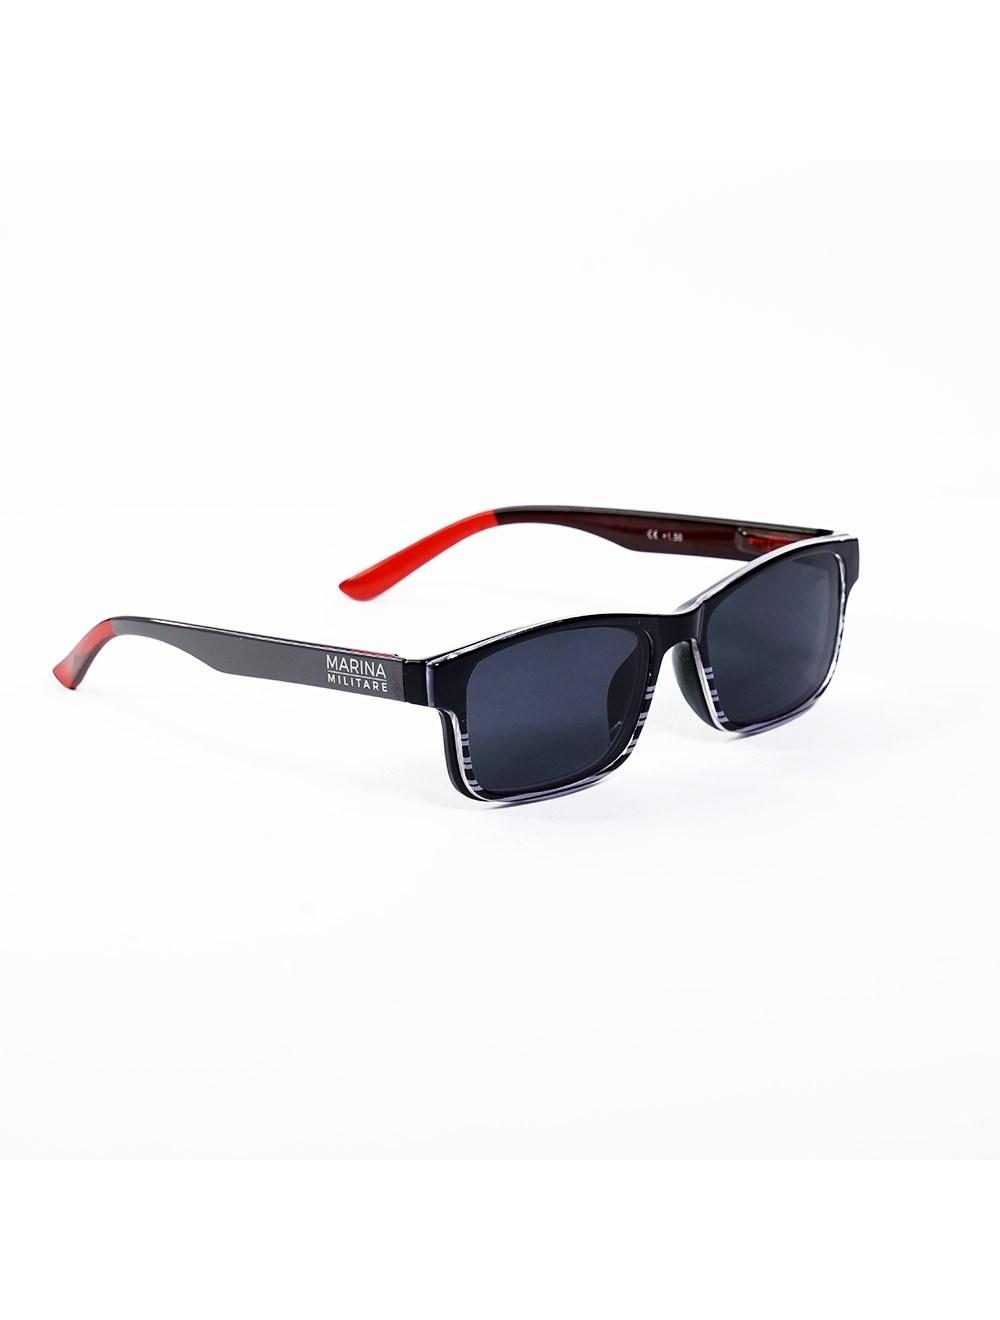 Reading Sunglasses 2,0 Marina Militare - Black